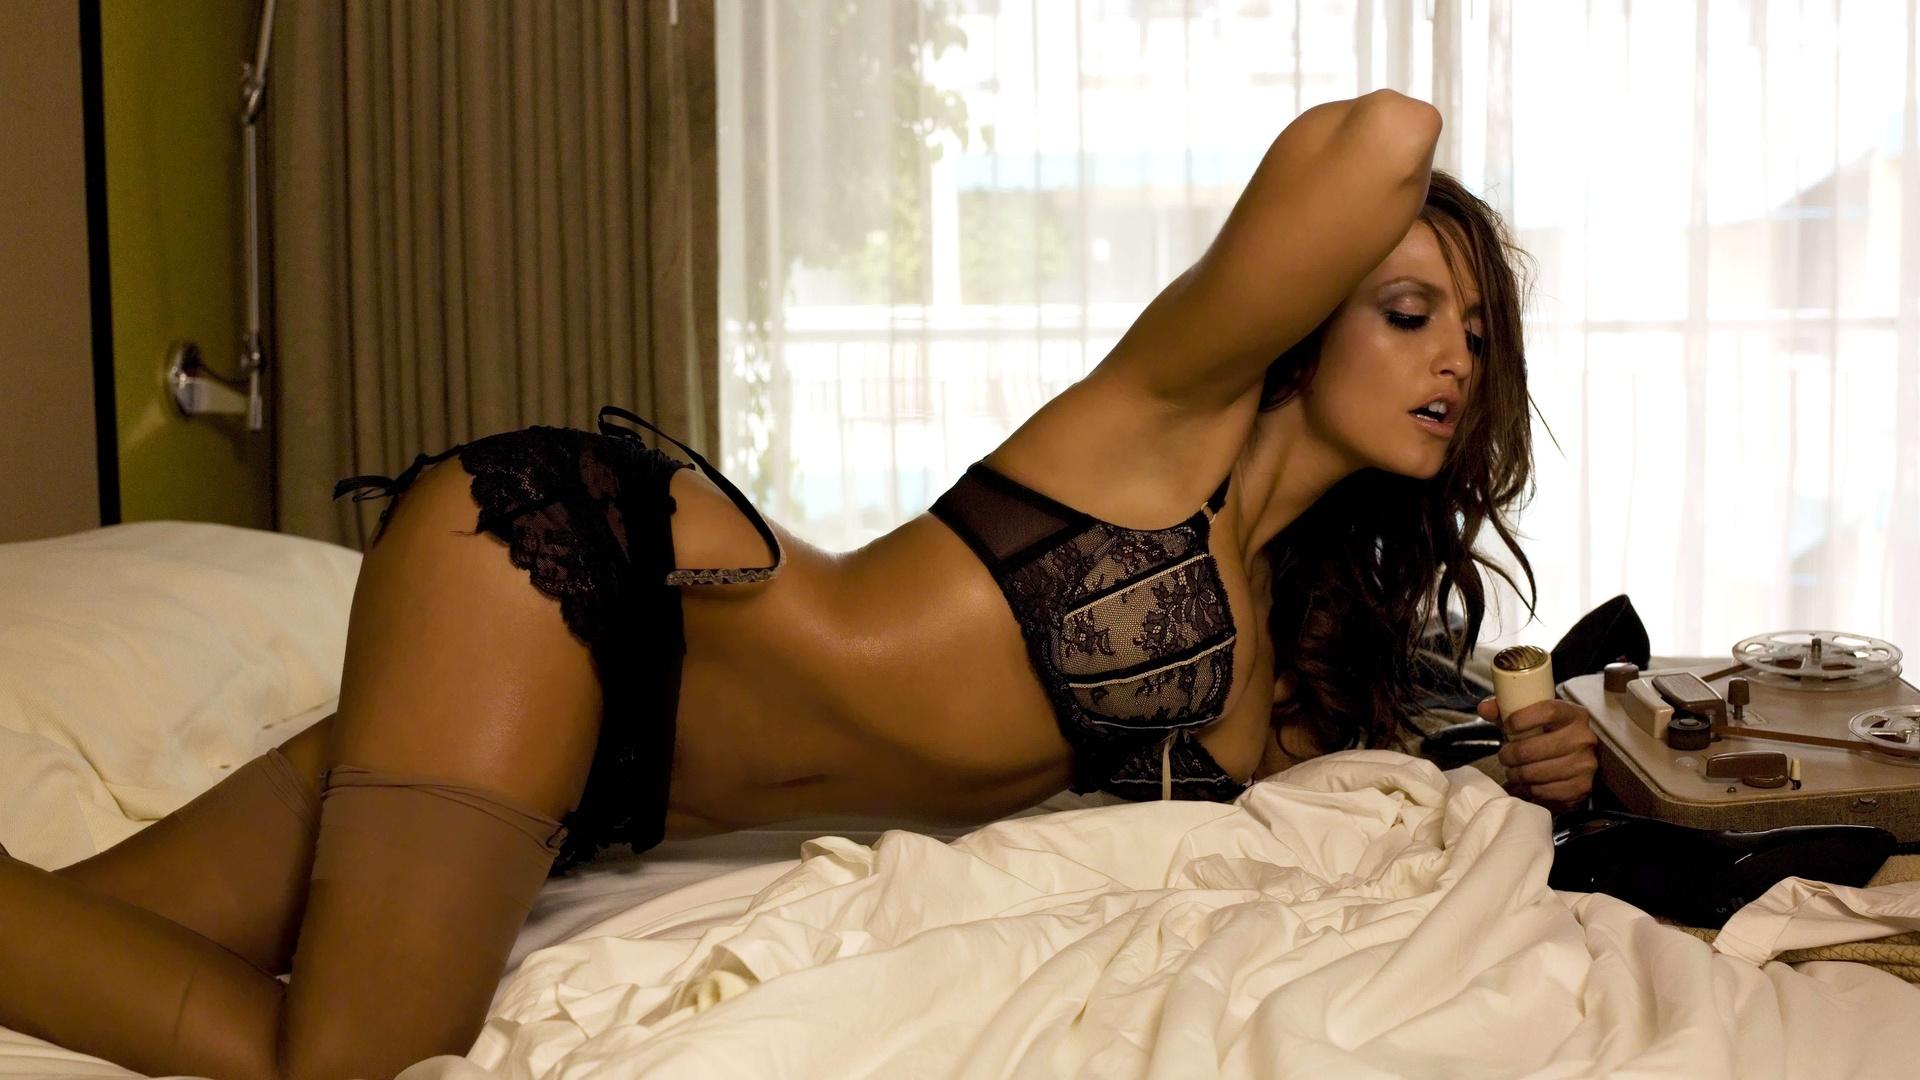 Video amazon women sexsy adult video